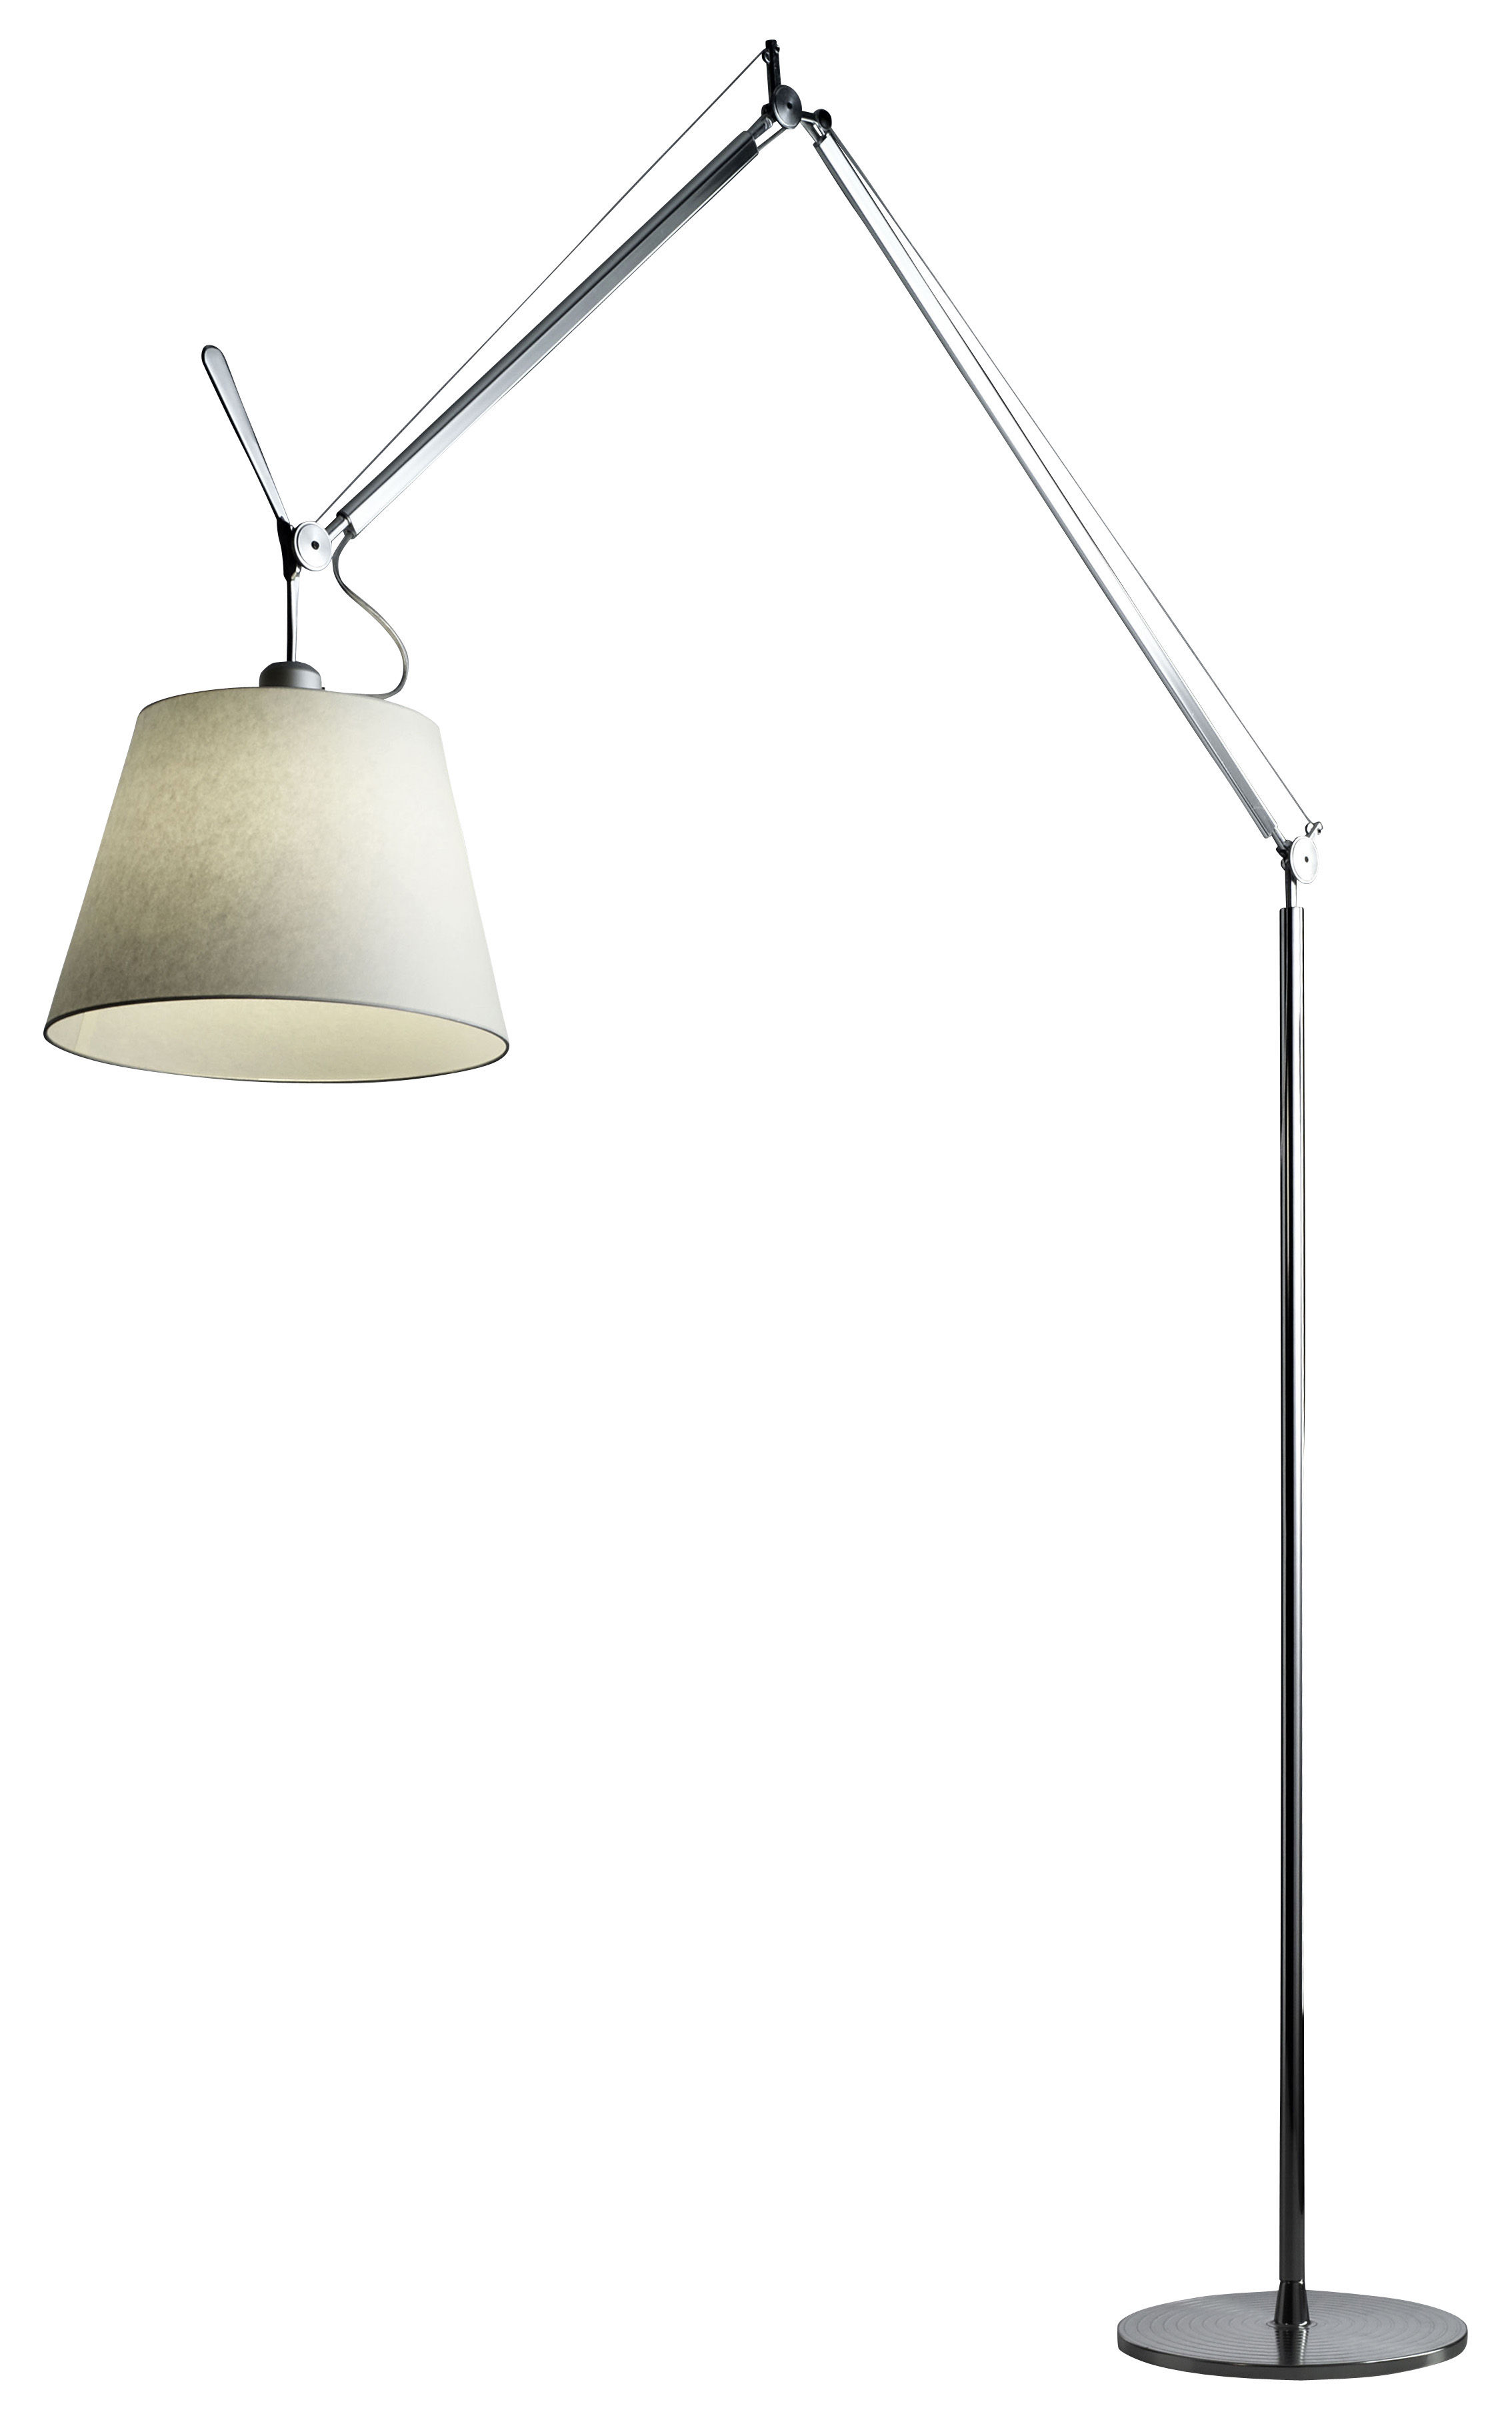 Illuminazione - Lampade da terra - Lampada a stelo Tolomeo Mega di Artemide - Paralume 36 cm - Alluminio, Carta pergamena